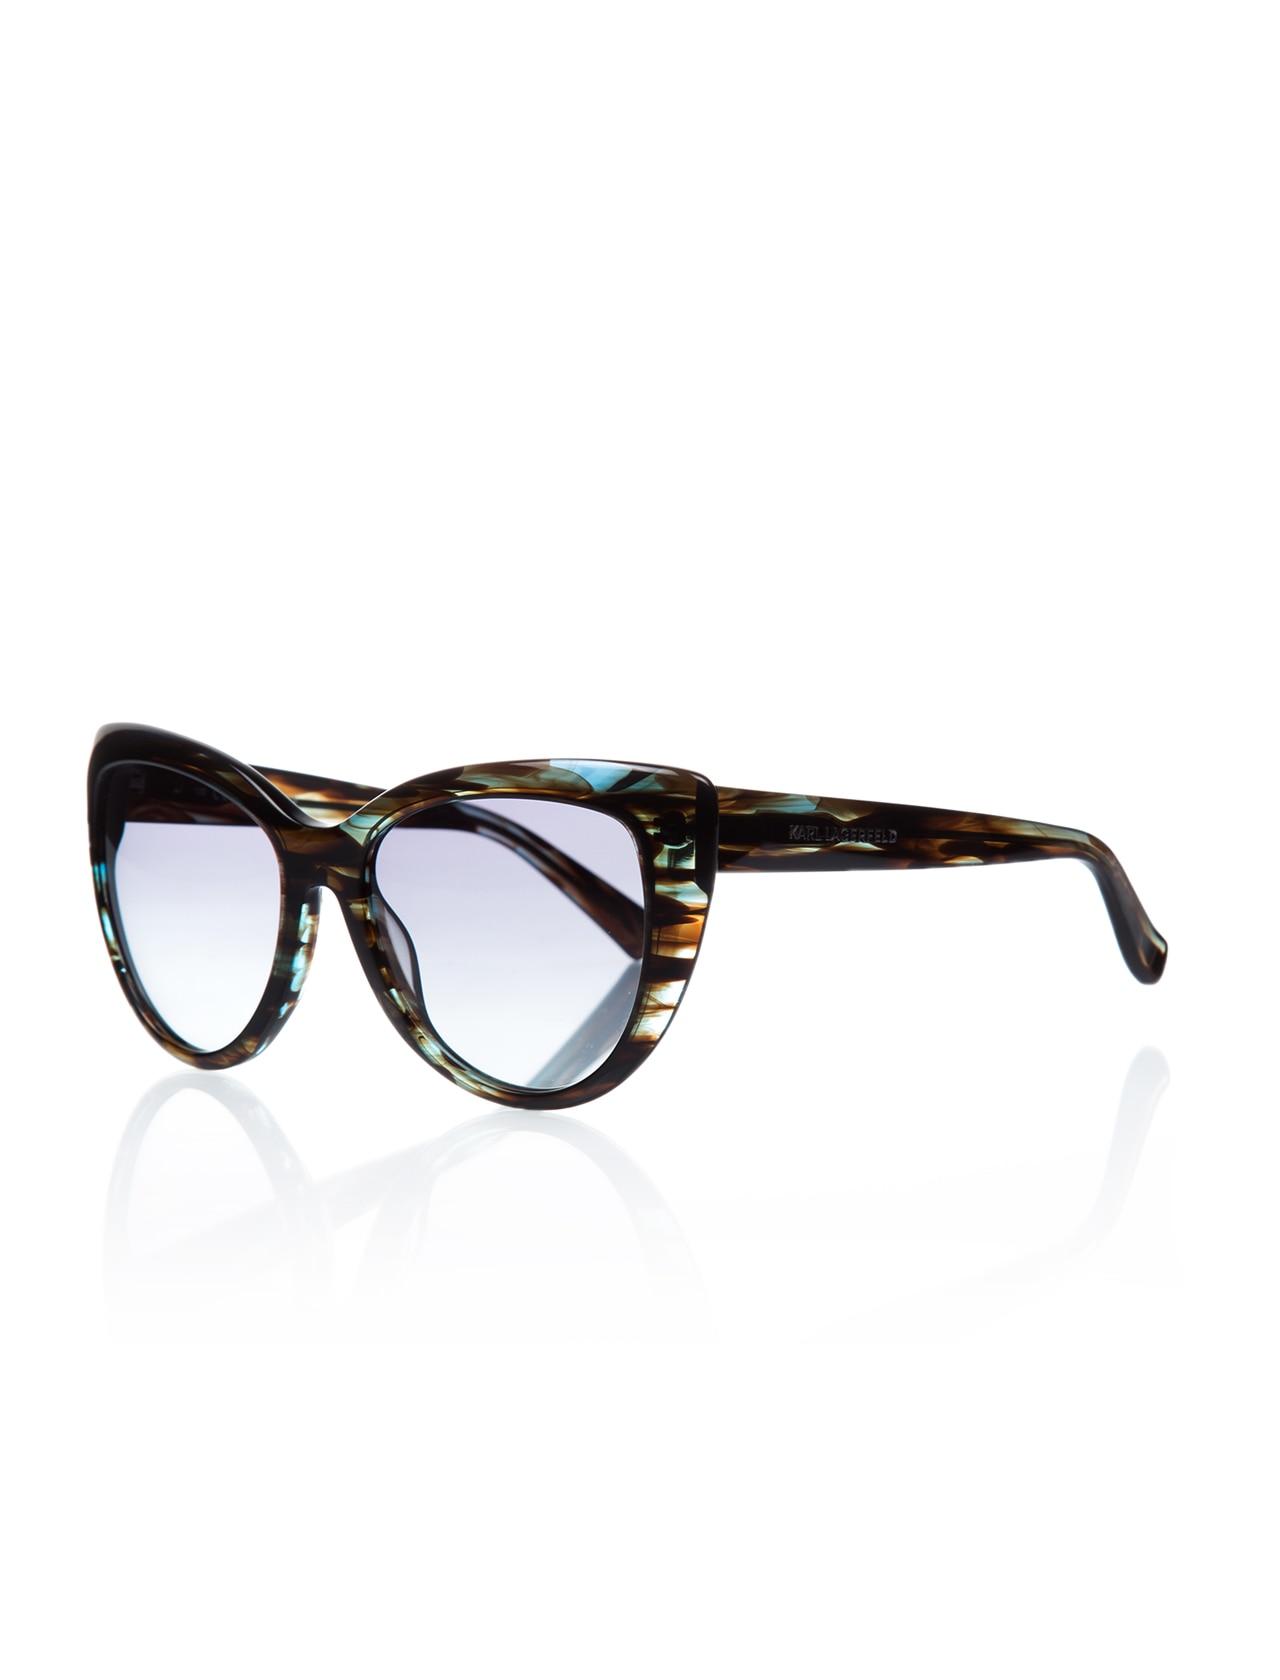 Women's sunglasses kl 833s 116 bone green organic butterfly cat eye 54-18-135 karl lagerfeld